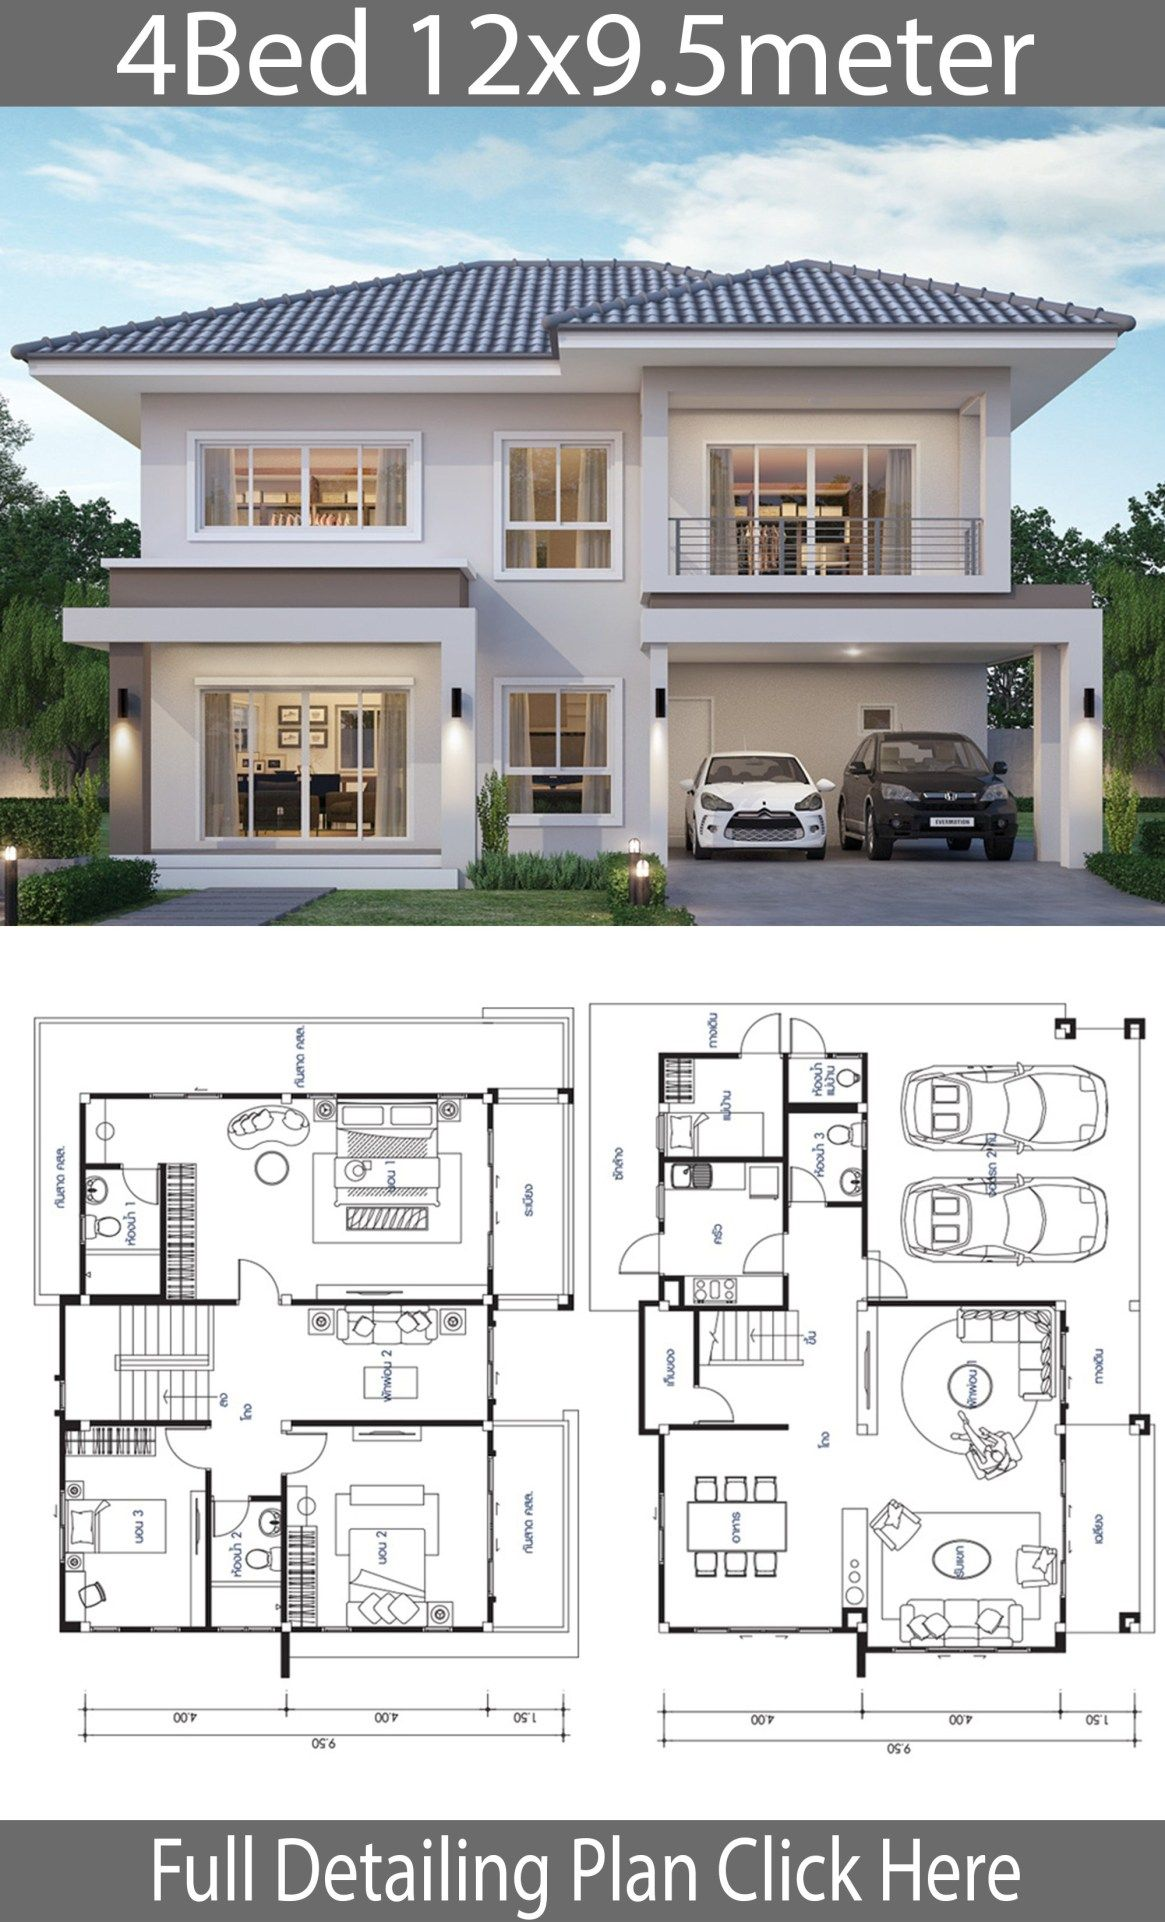 10 Bedroom Modern House Plans 10 Floors - Novocom.top